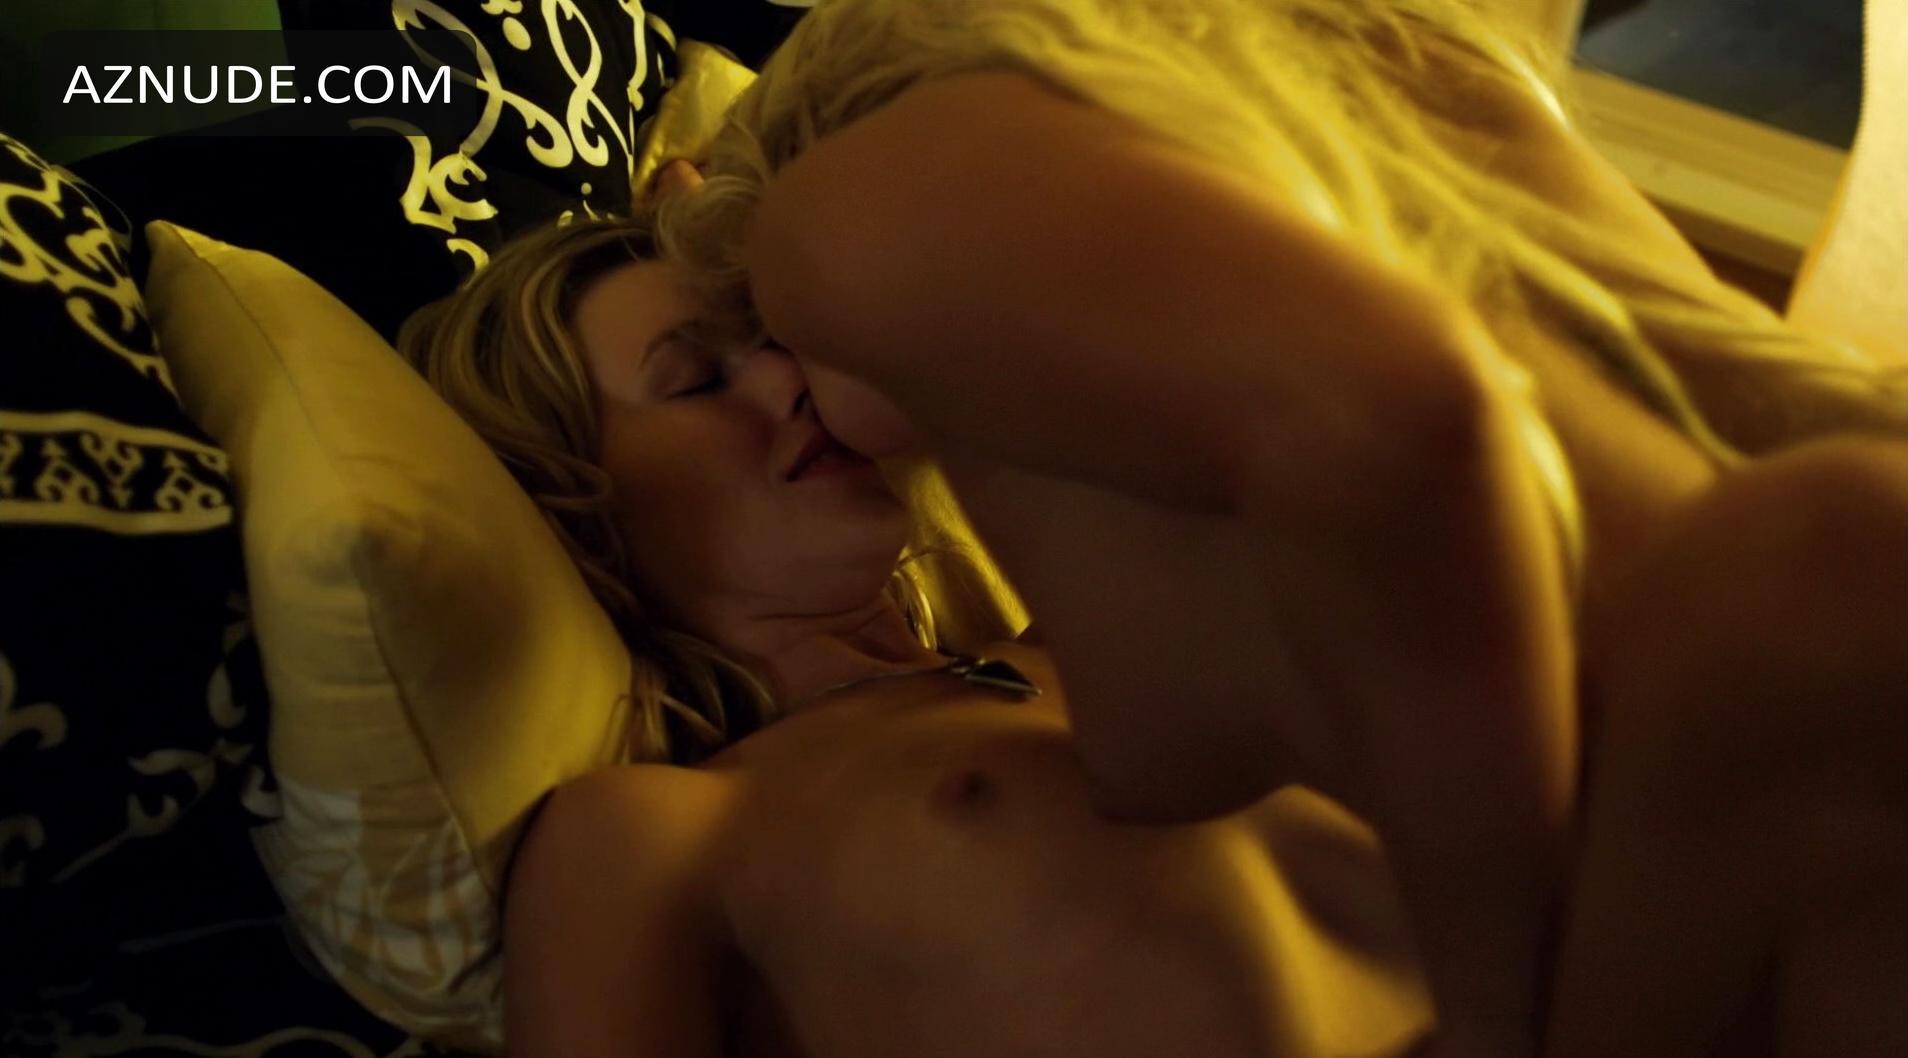 Final, Pictures of nude vampire sex return